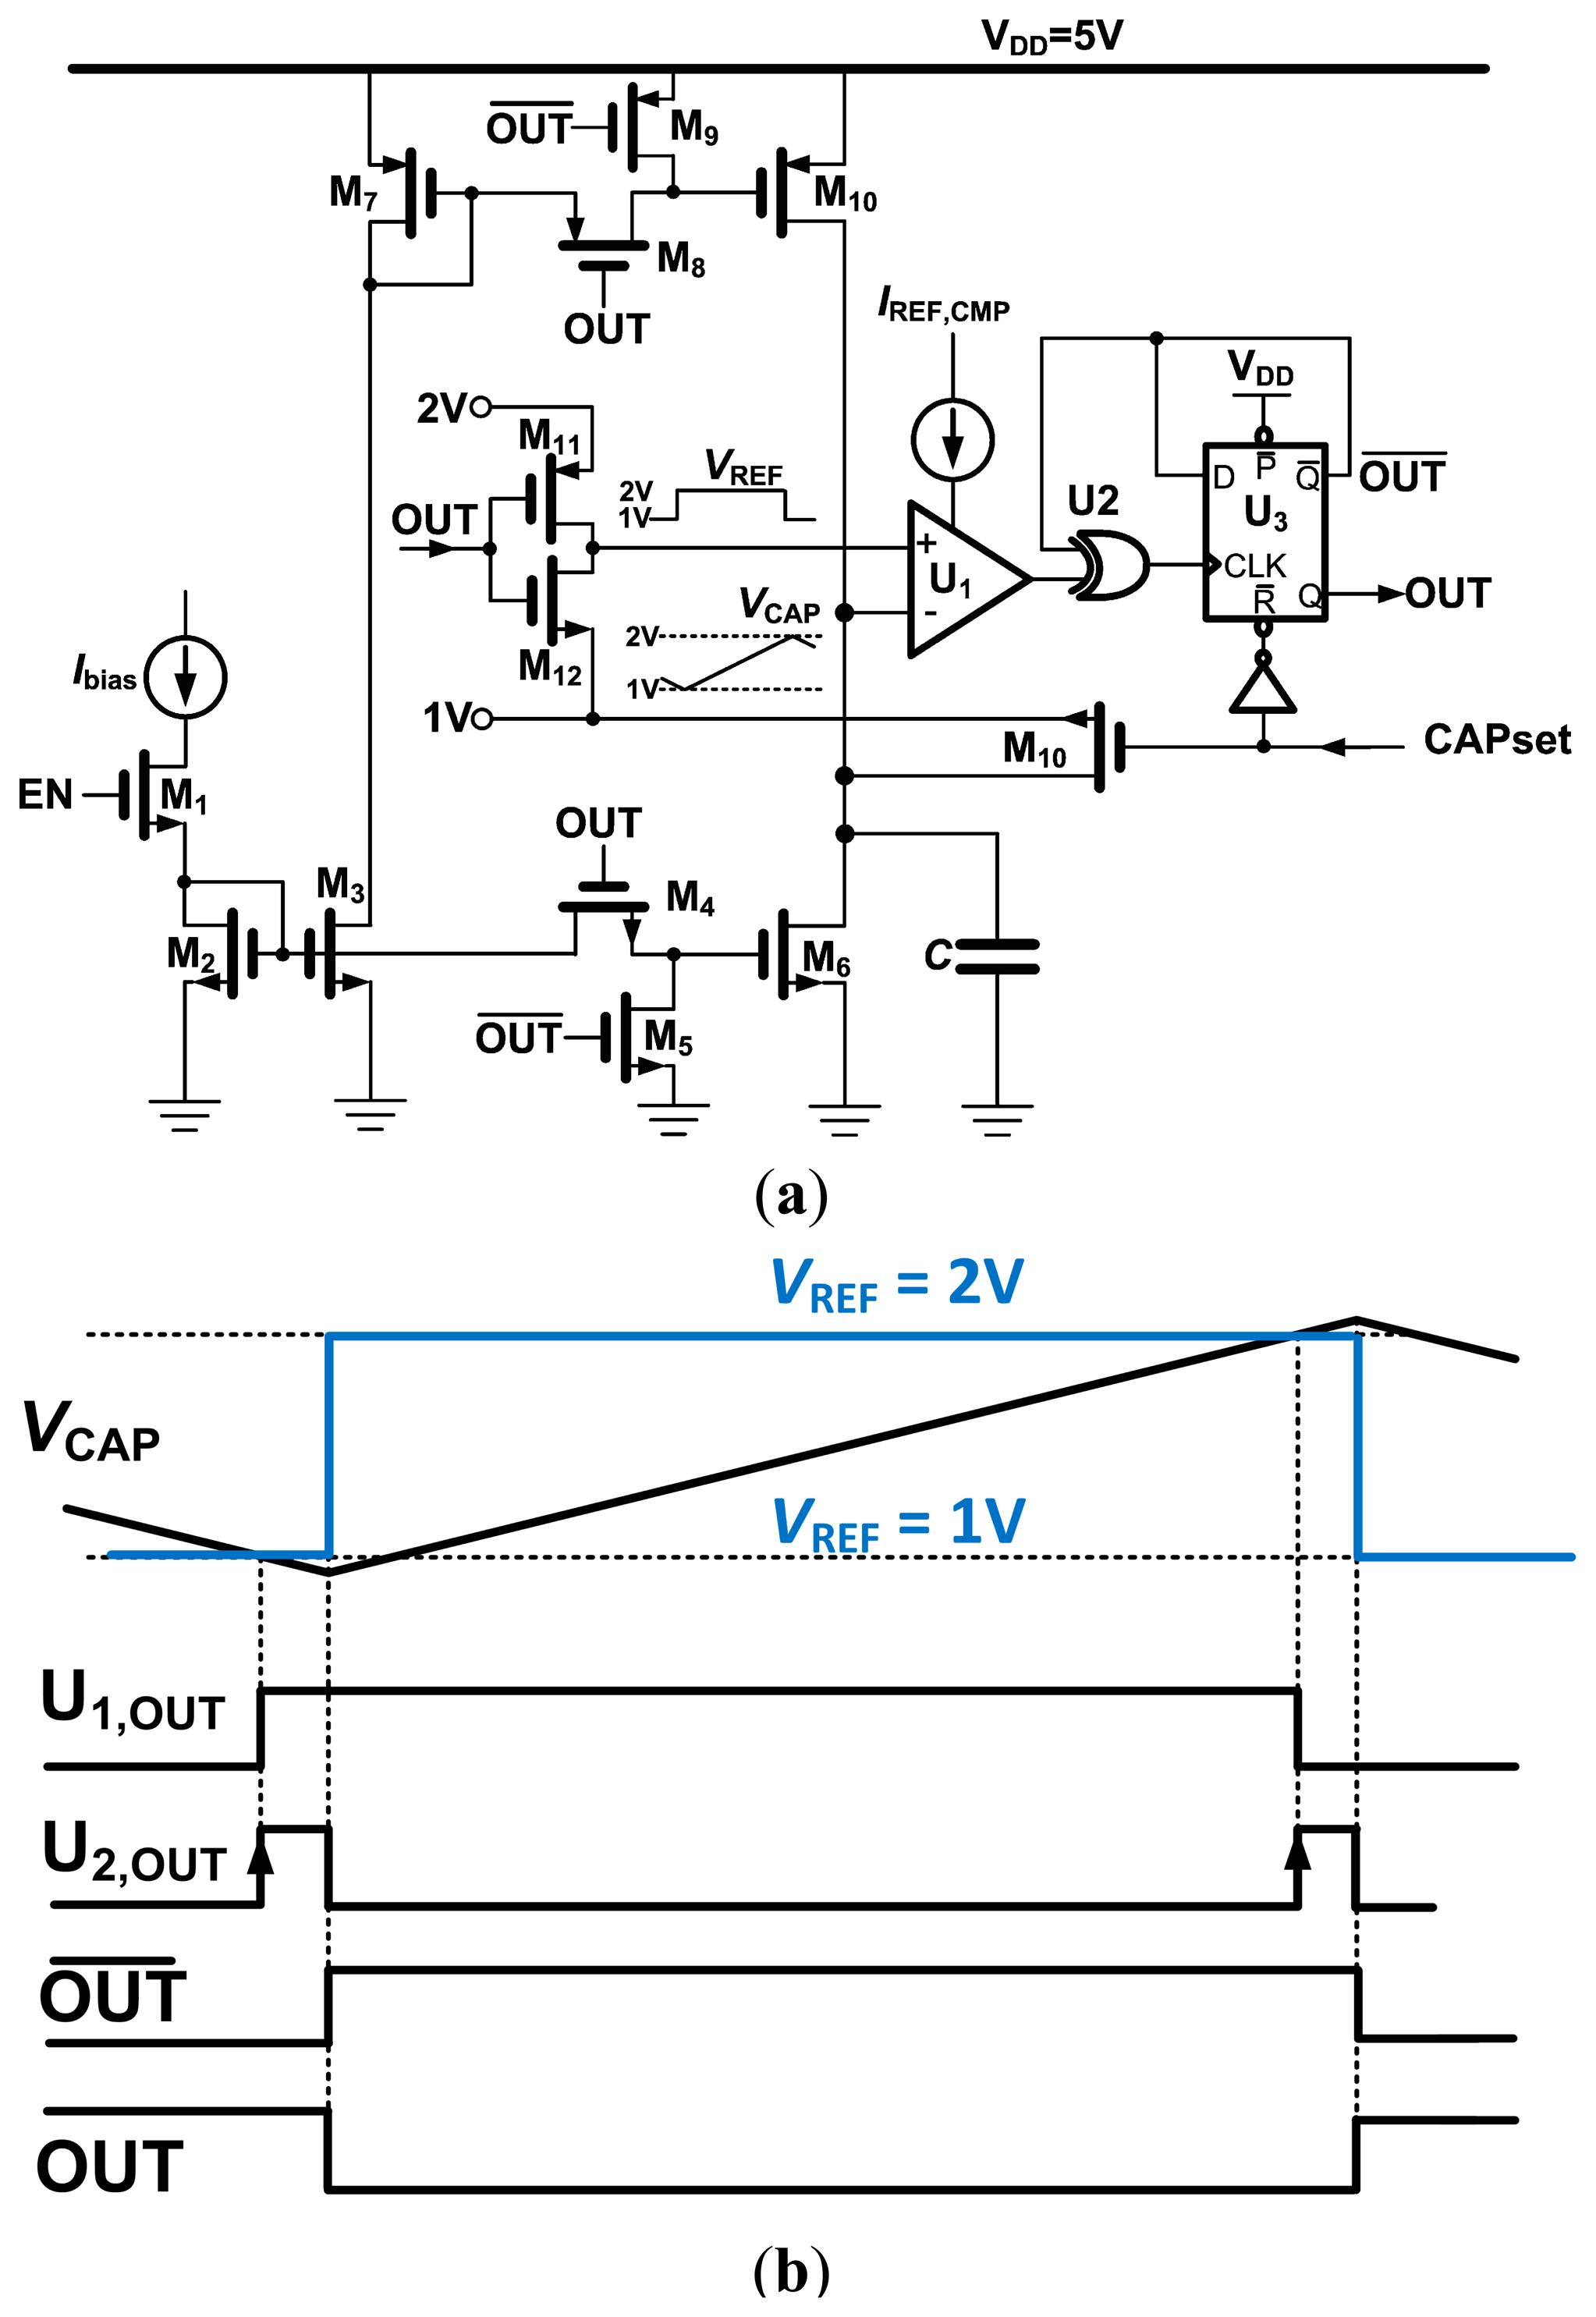 Sensors Free Full Text A Cmos Smart Temperature And Humidity Temp Wiring Diagram 14 17192f6 1024